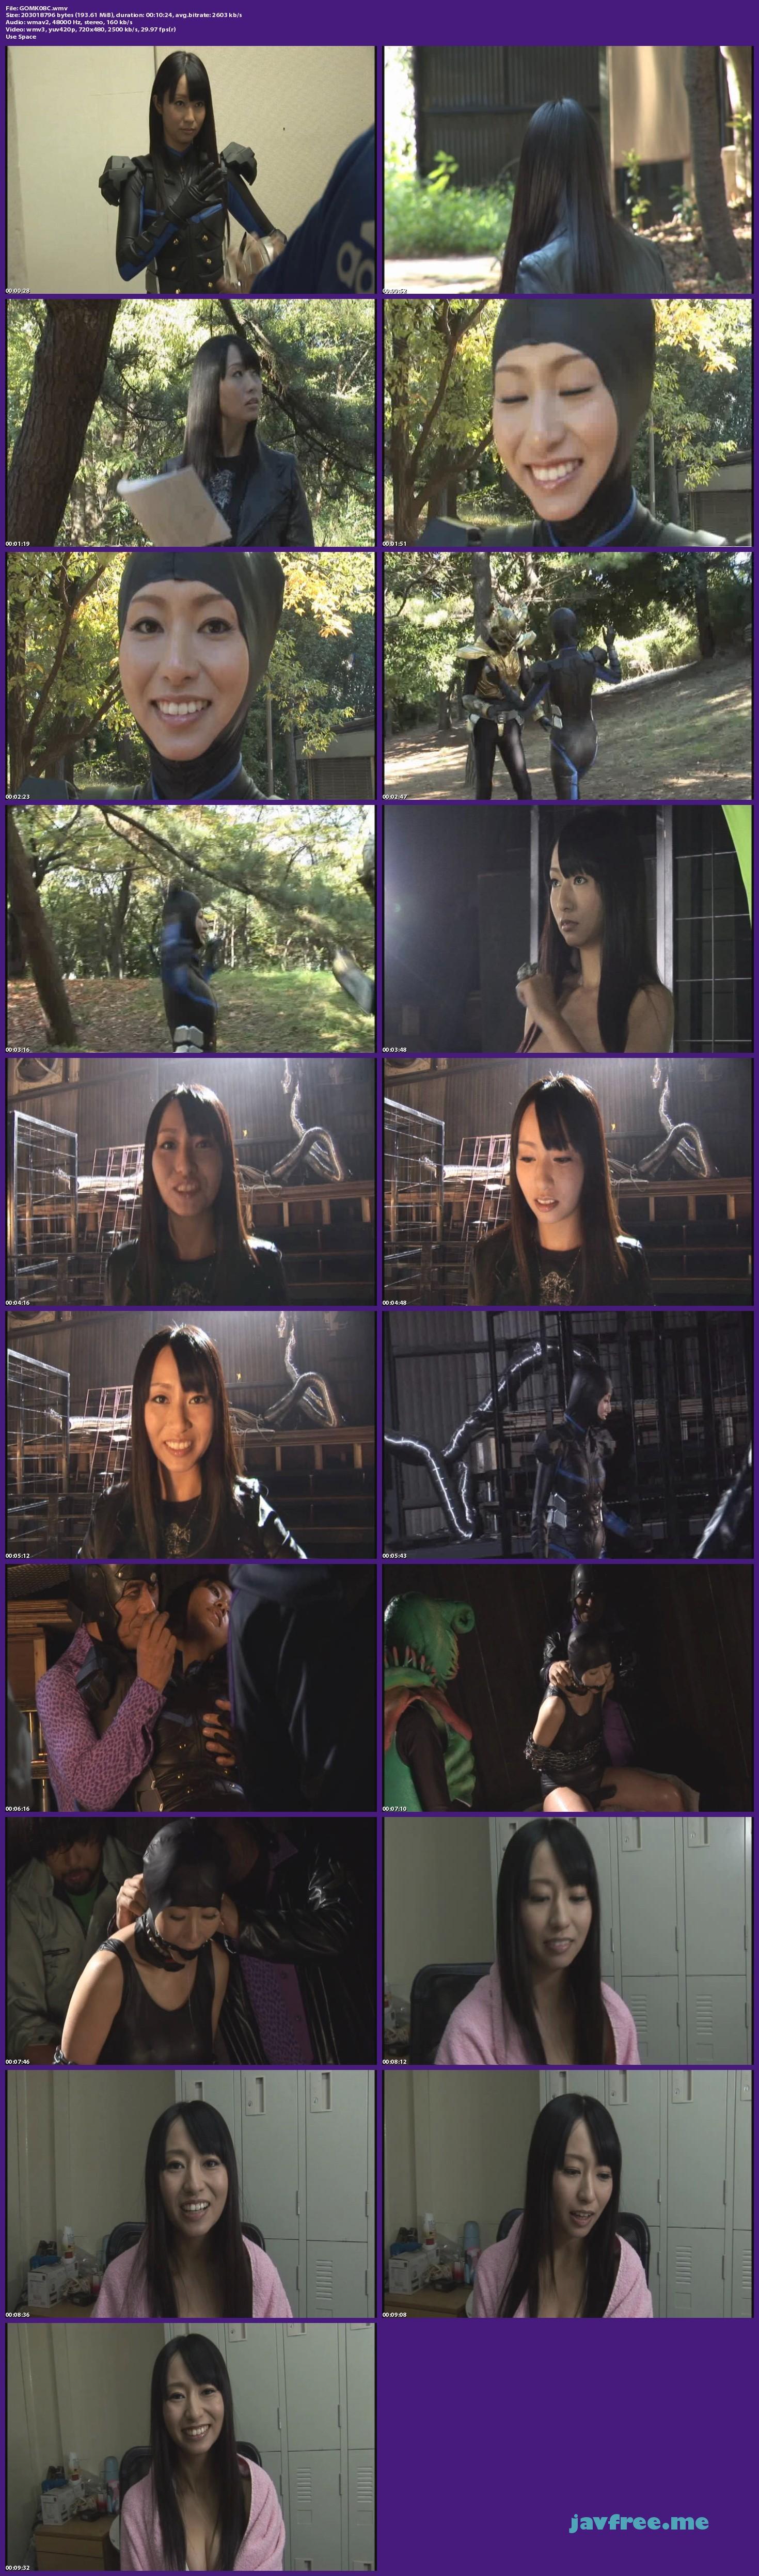 [GOMK-08] クールビューティーヒロイン ストライダー 東尾真子 - image GOMK08C_s on https://javfree.me